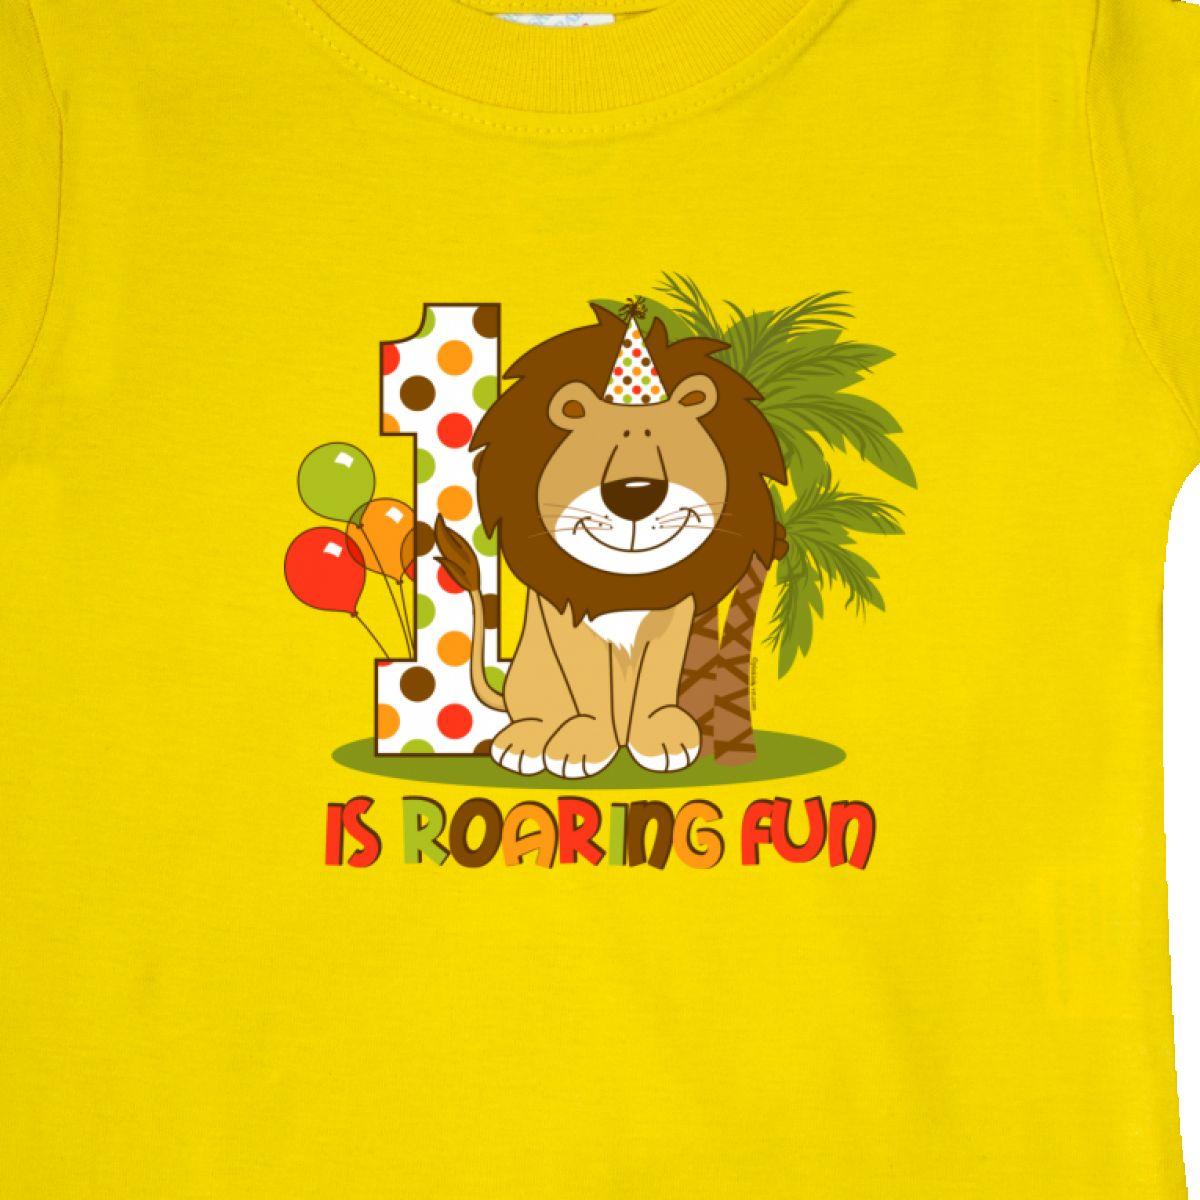 Inktastic-Cute-Lion-1st-Birthday-Baby-T-Shirt-Roaring-Fun-Pinkinkartkids-First thumbnail 24